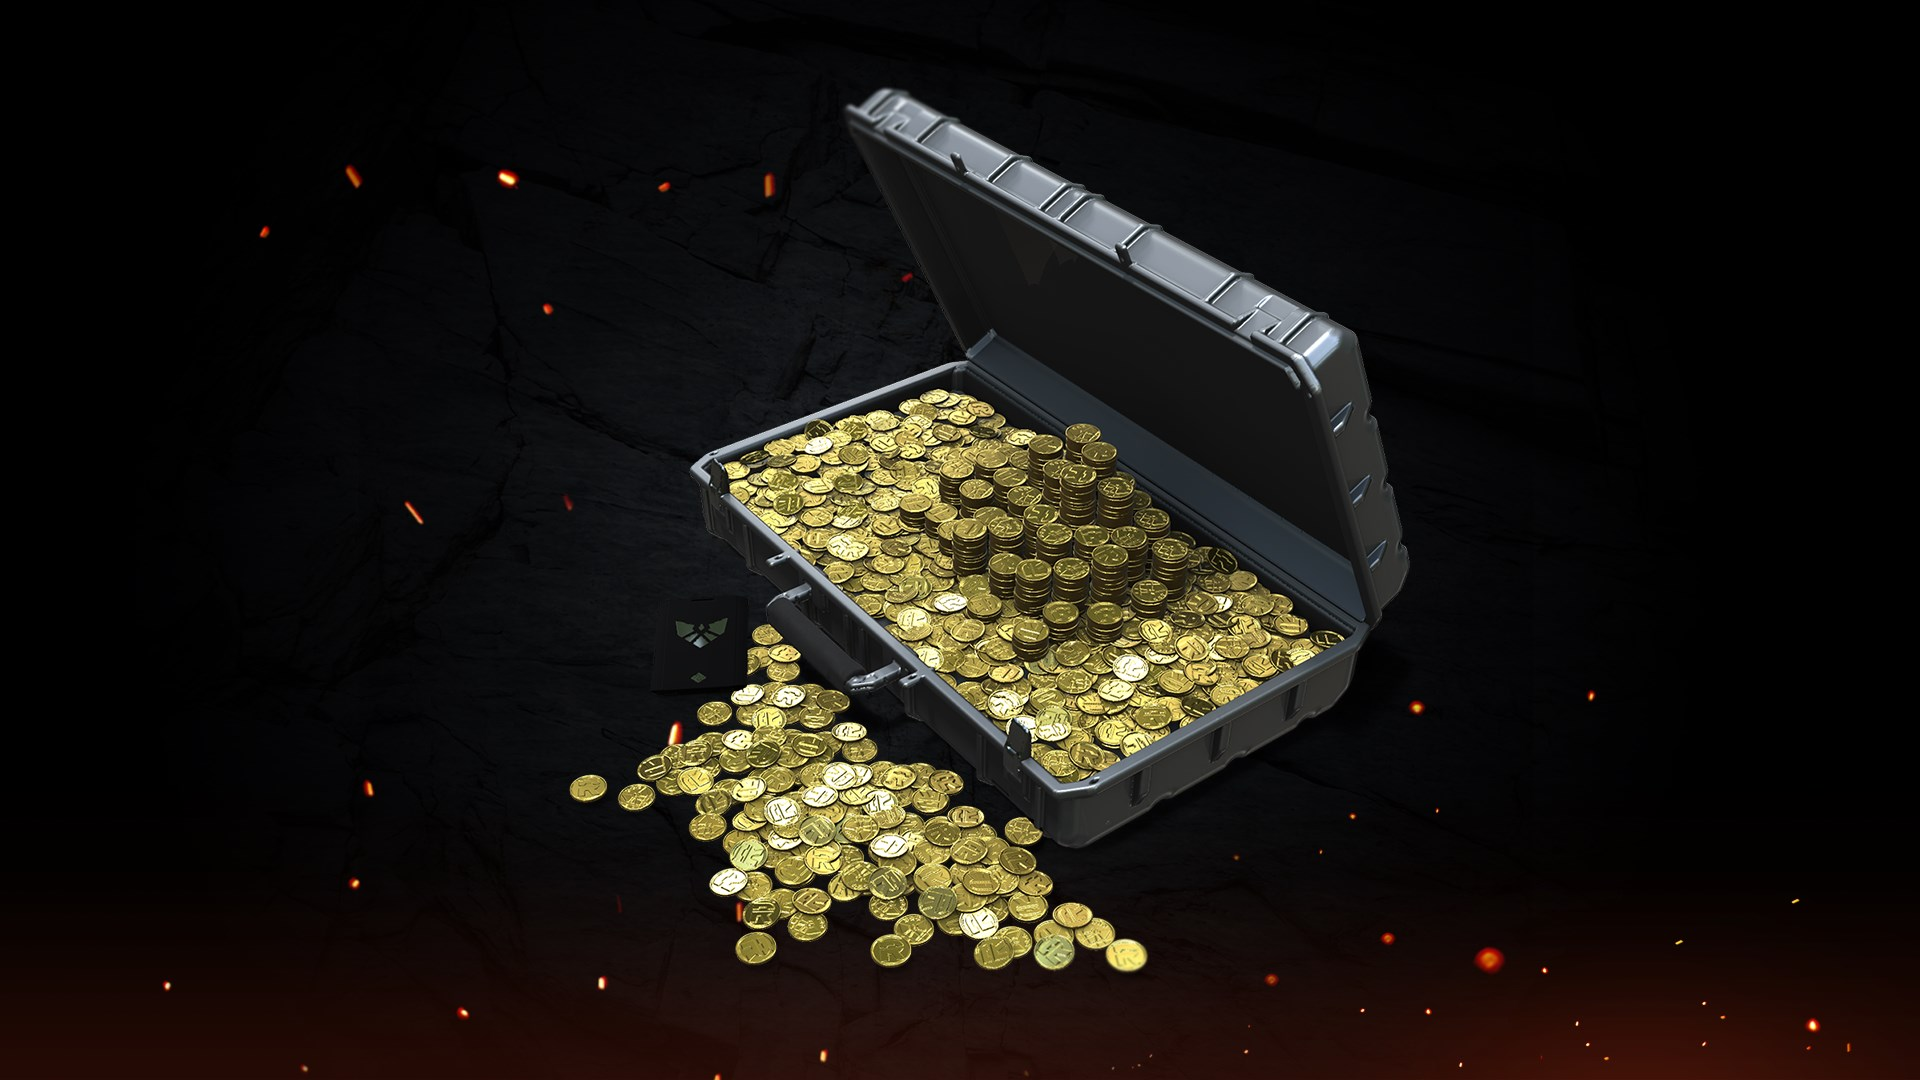 13,500 Rogue Bucks